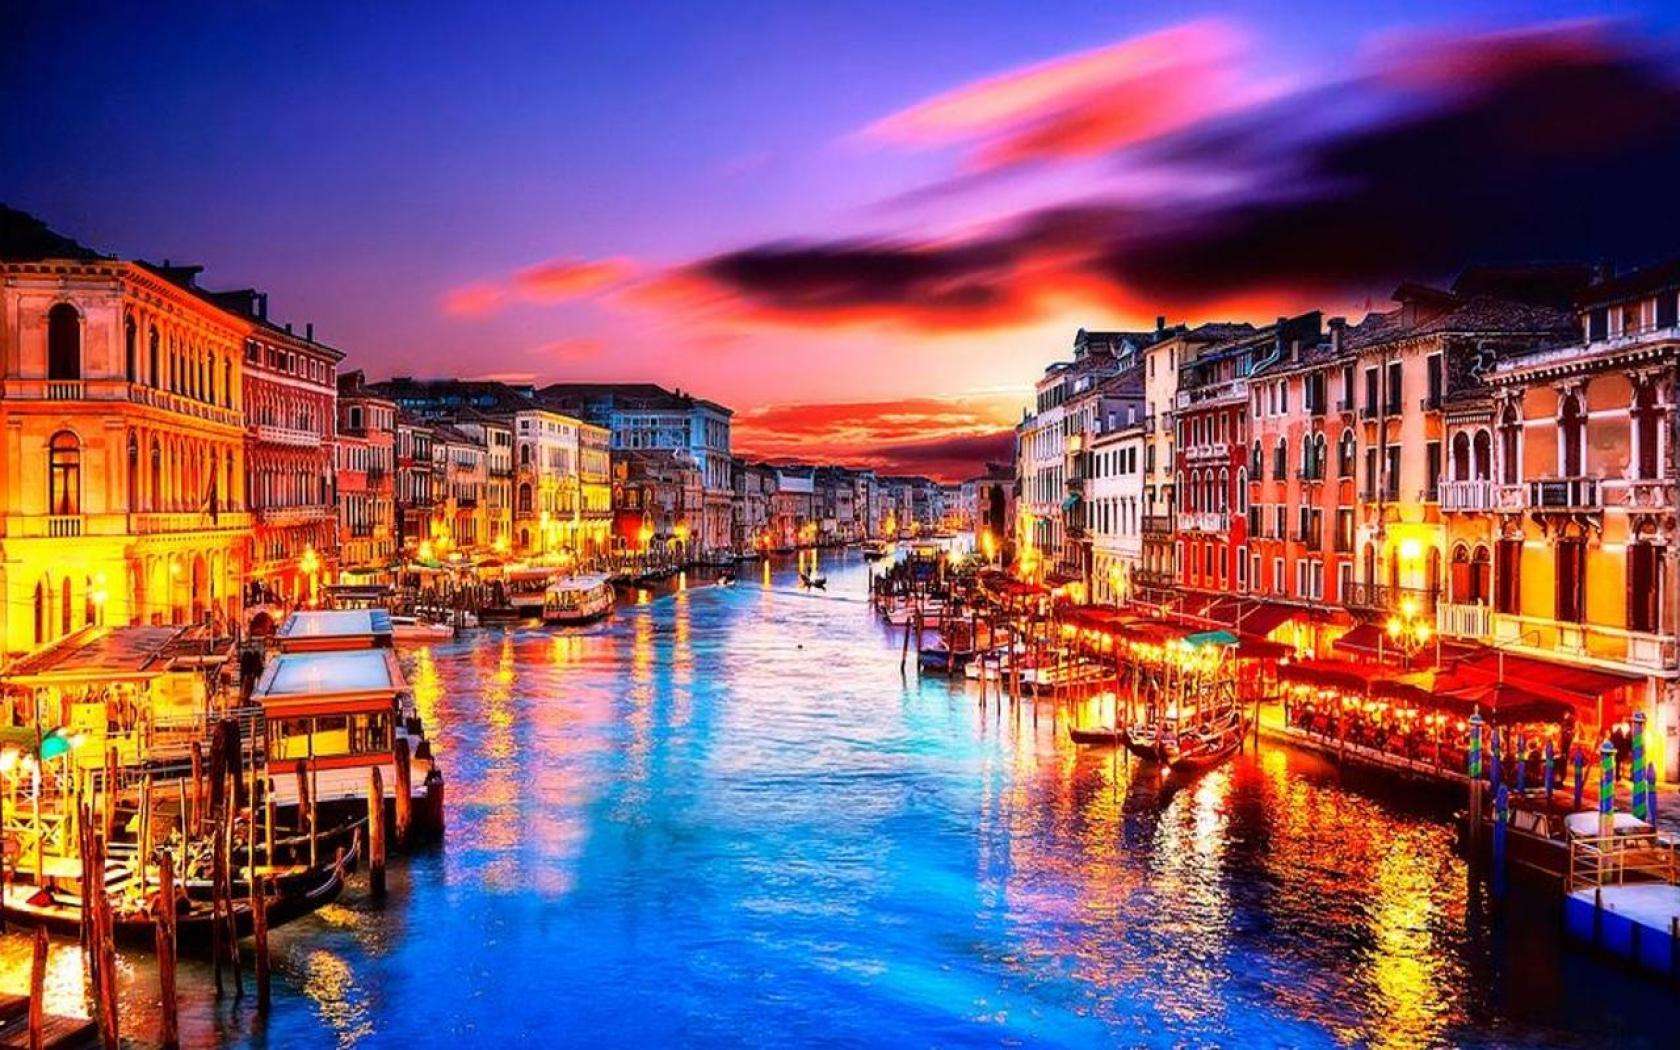 Venice Gondola Romantic HD Wallpaper Background Images 1680x1050